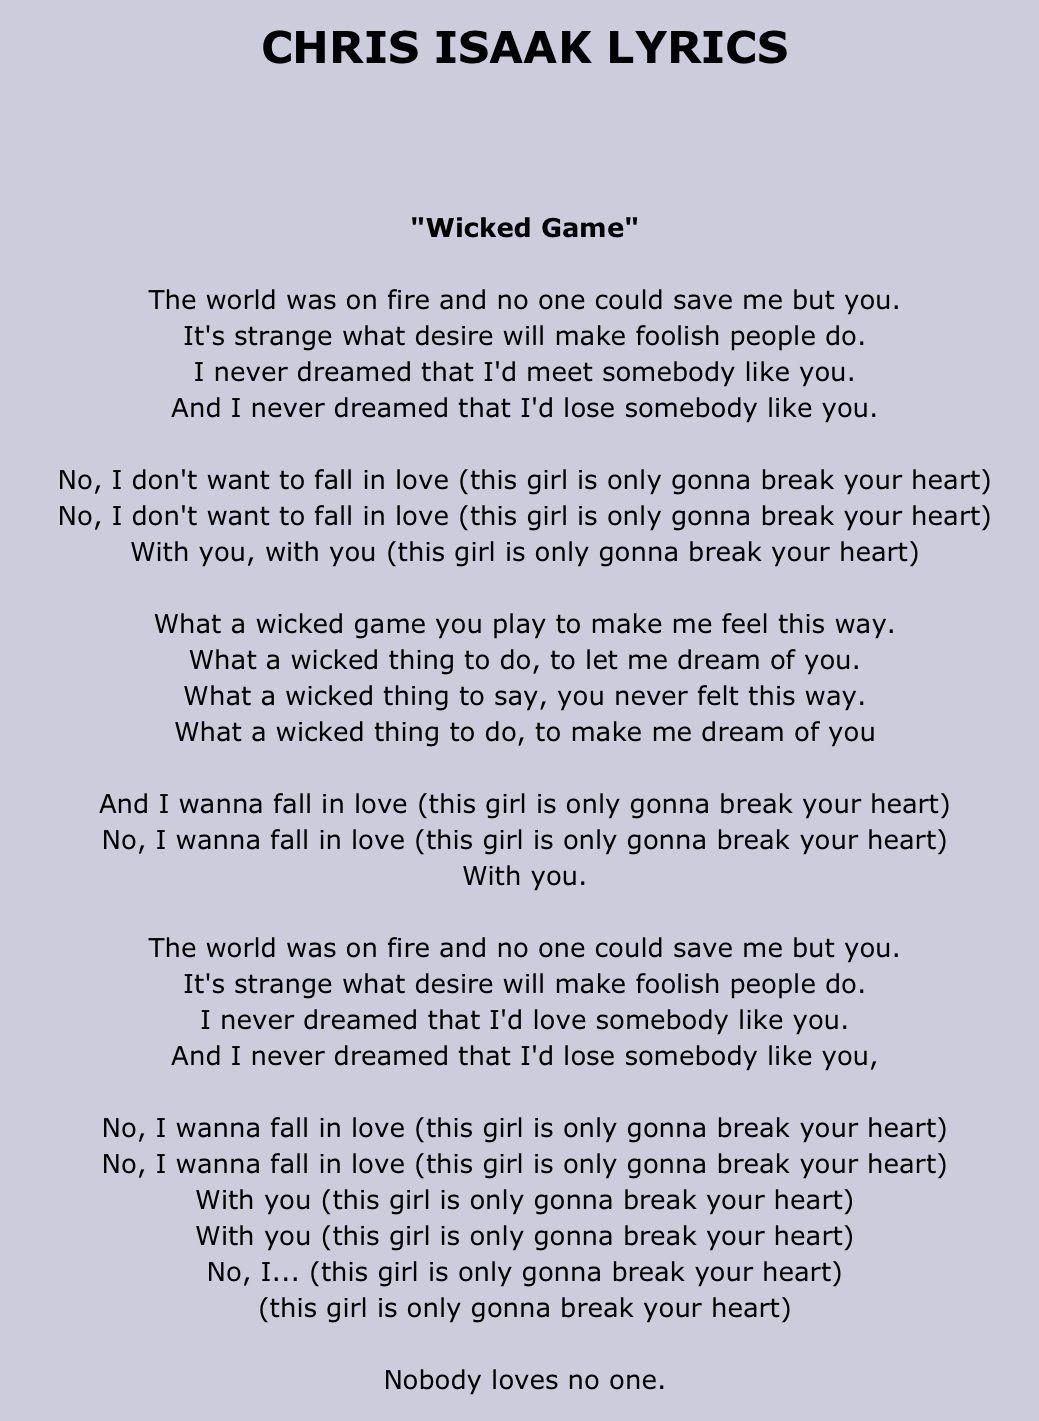 Tab4U.com - Chris Isaak - Wicked Game Chords and Lyrics